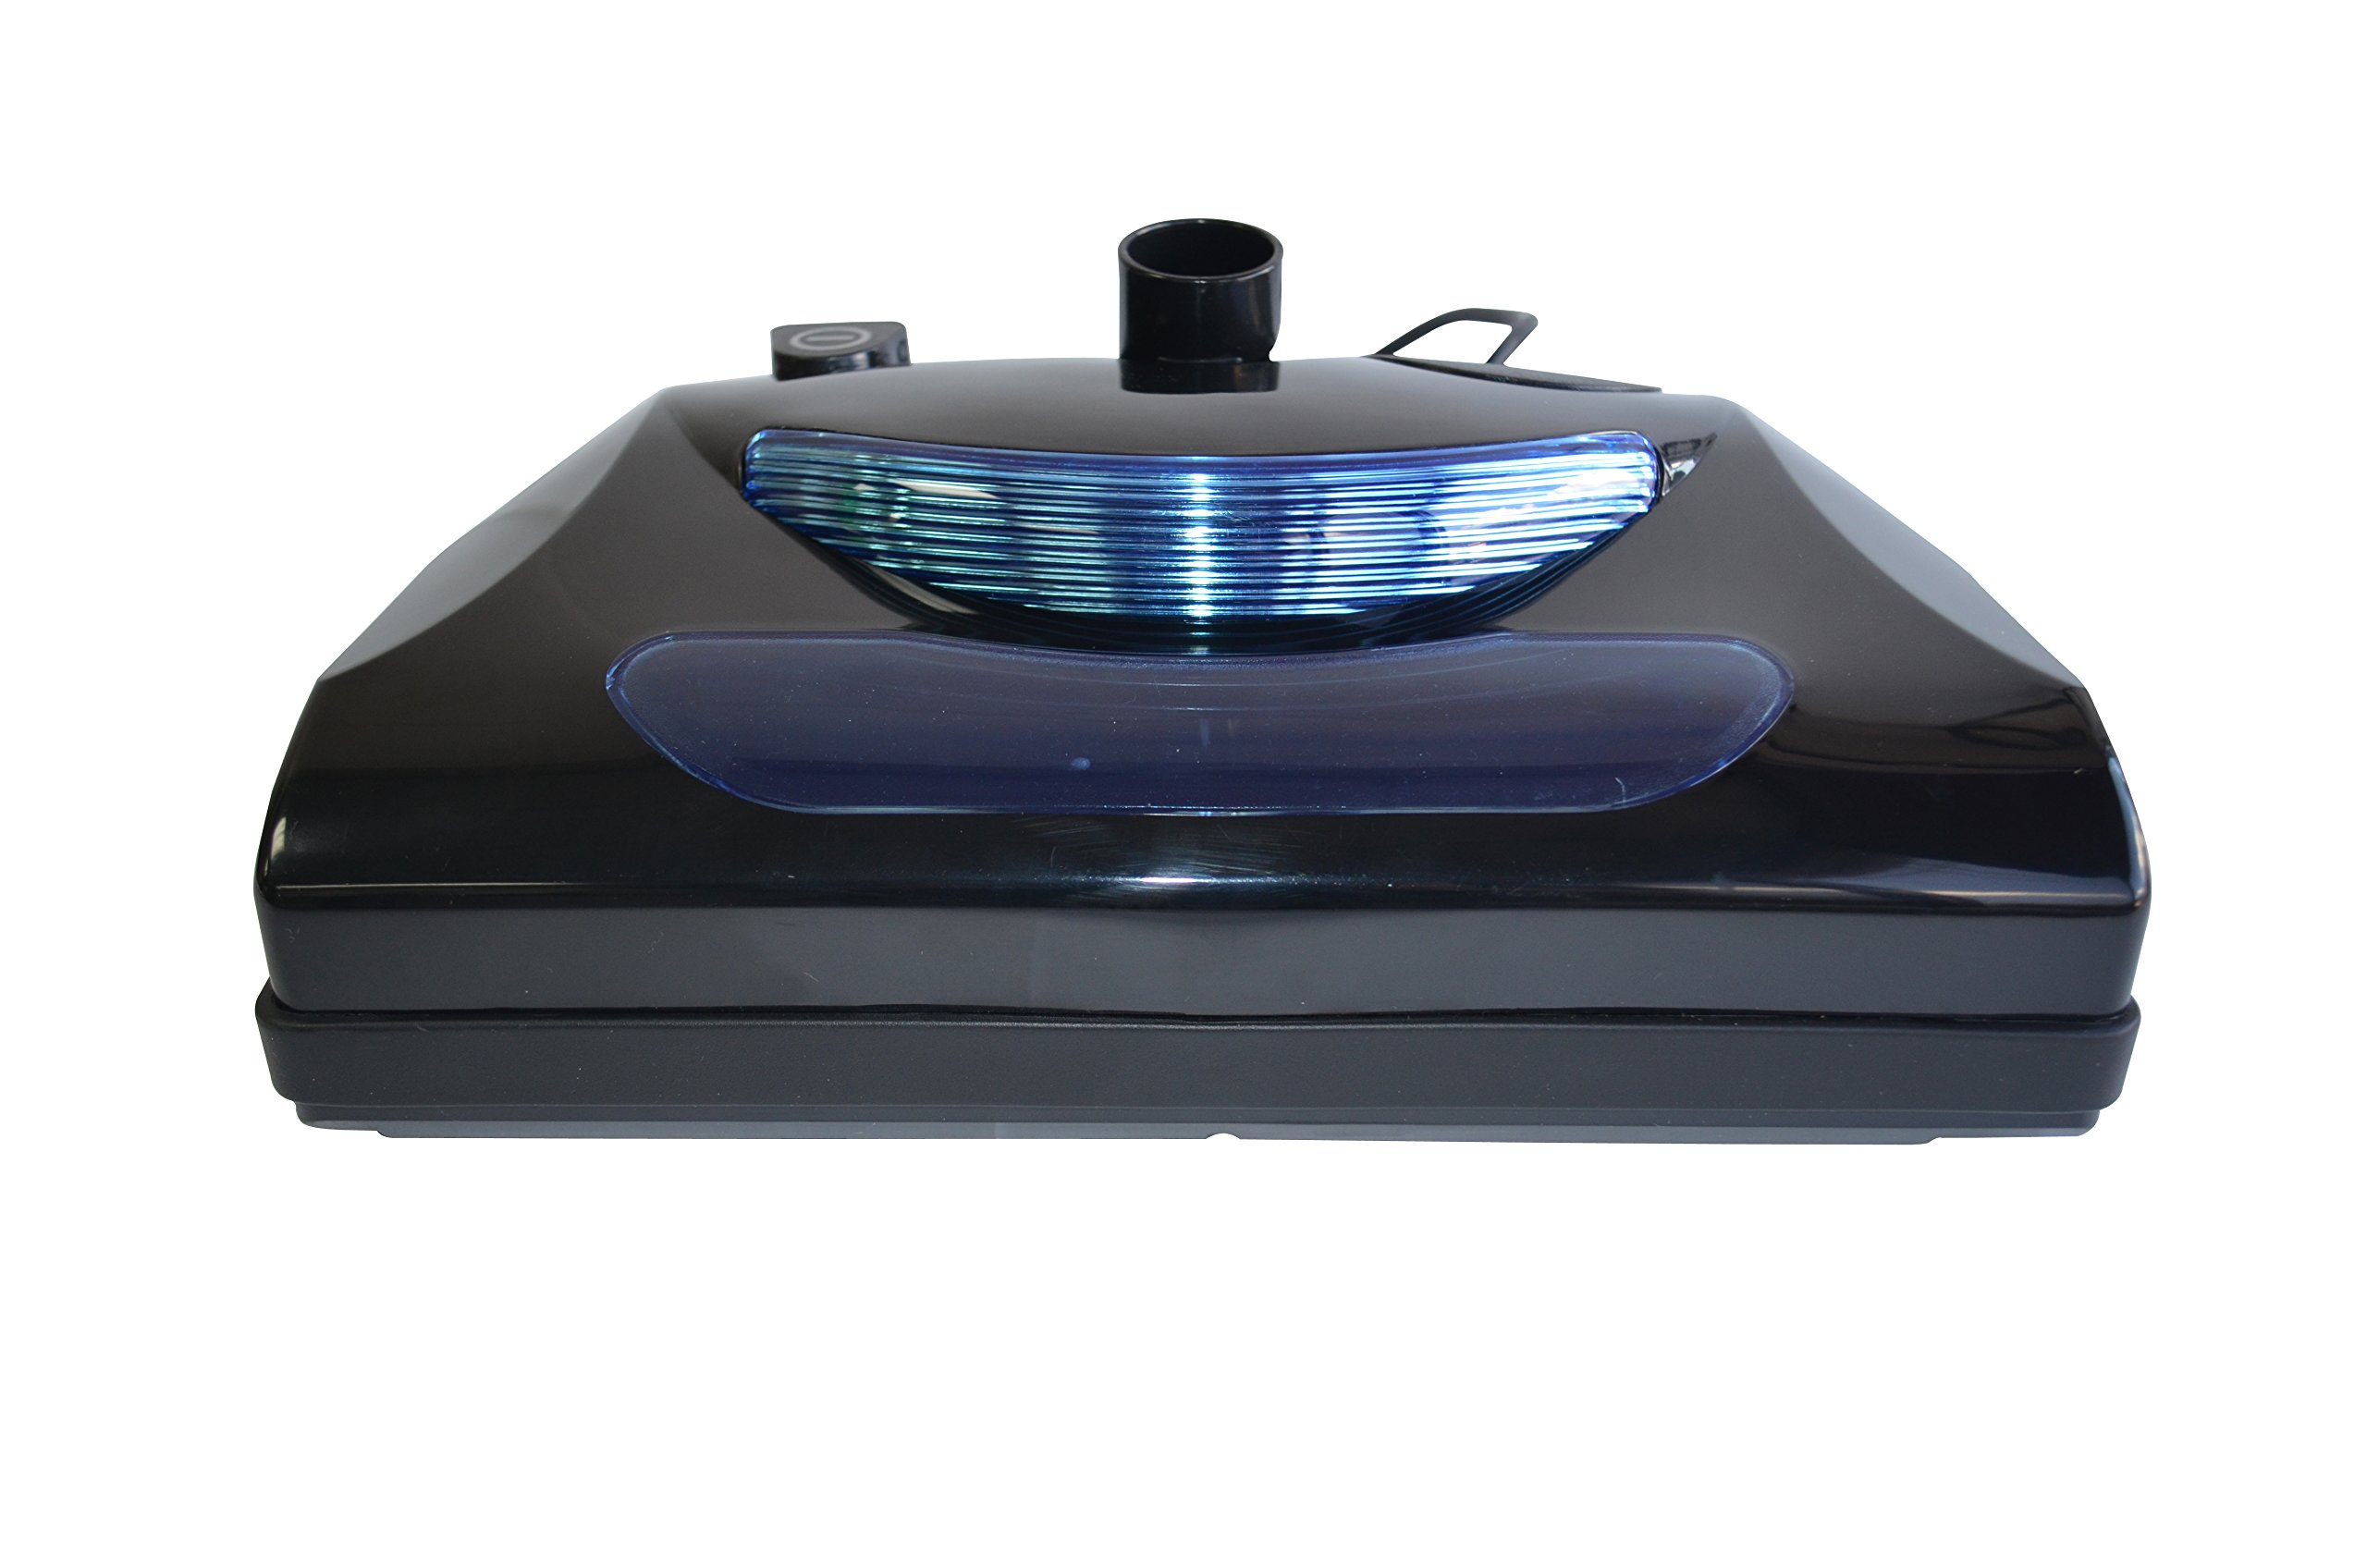 ZVac EX Central Vacuum Powerhead With Metal Roller & Geared Belt System. ZVac Generic Powerhead Fits: Nutone, Beam & More!